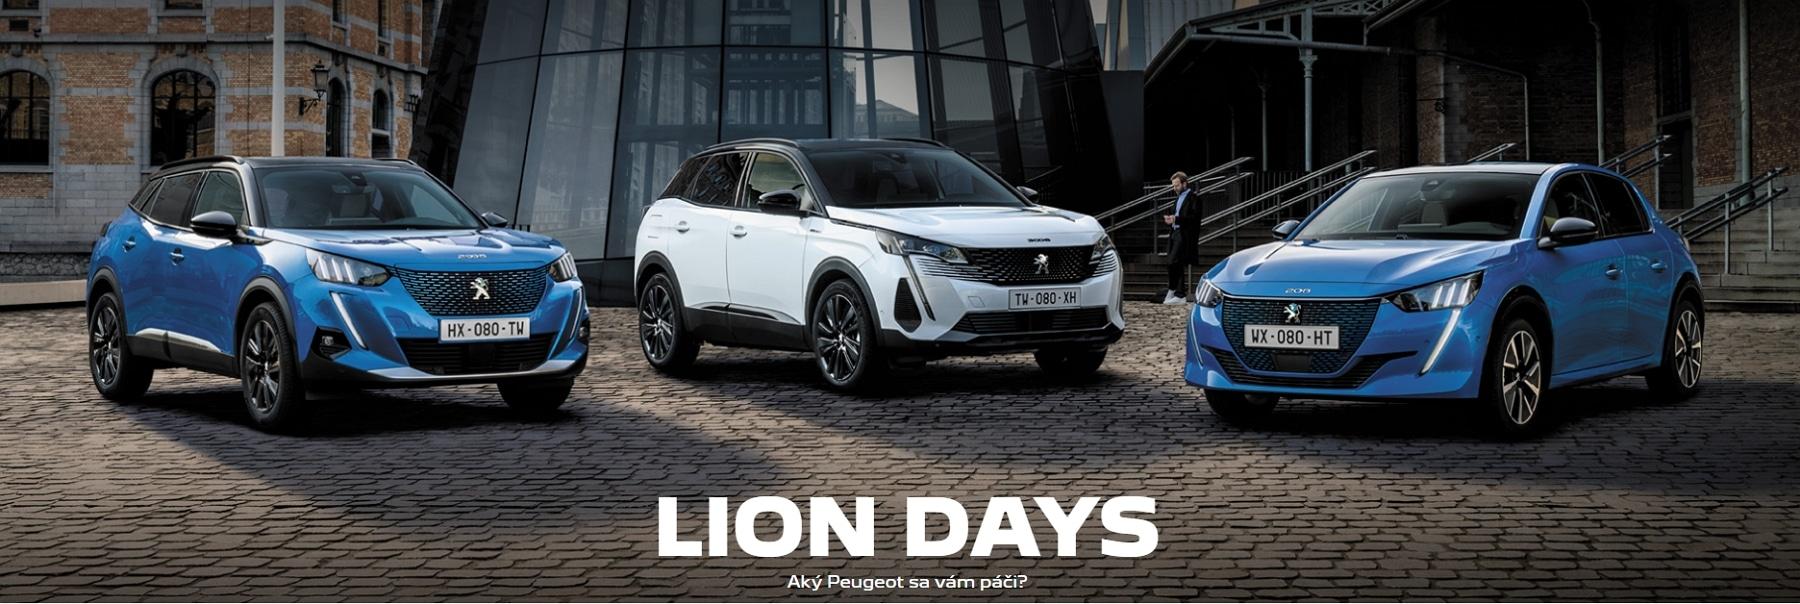 Peugeot Lion Days Akcia B